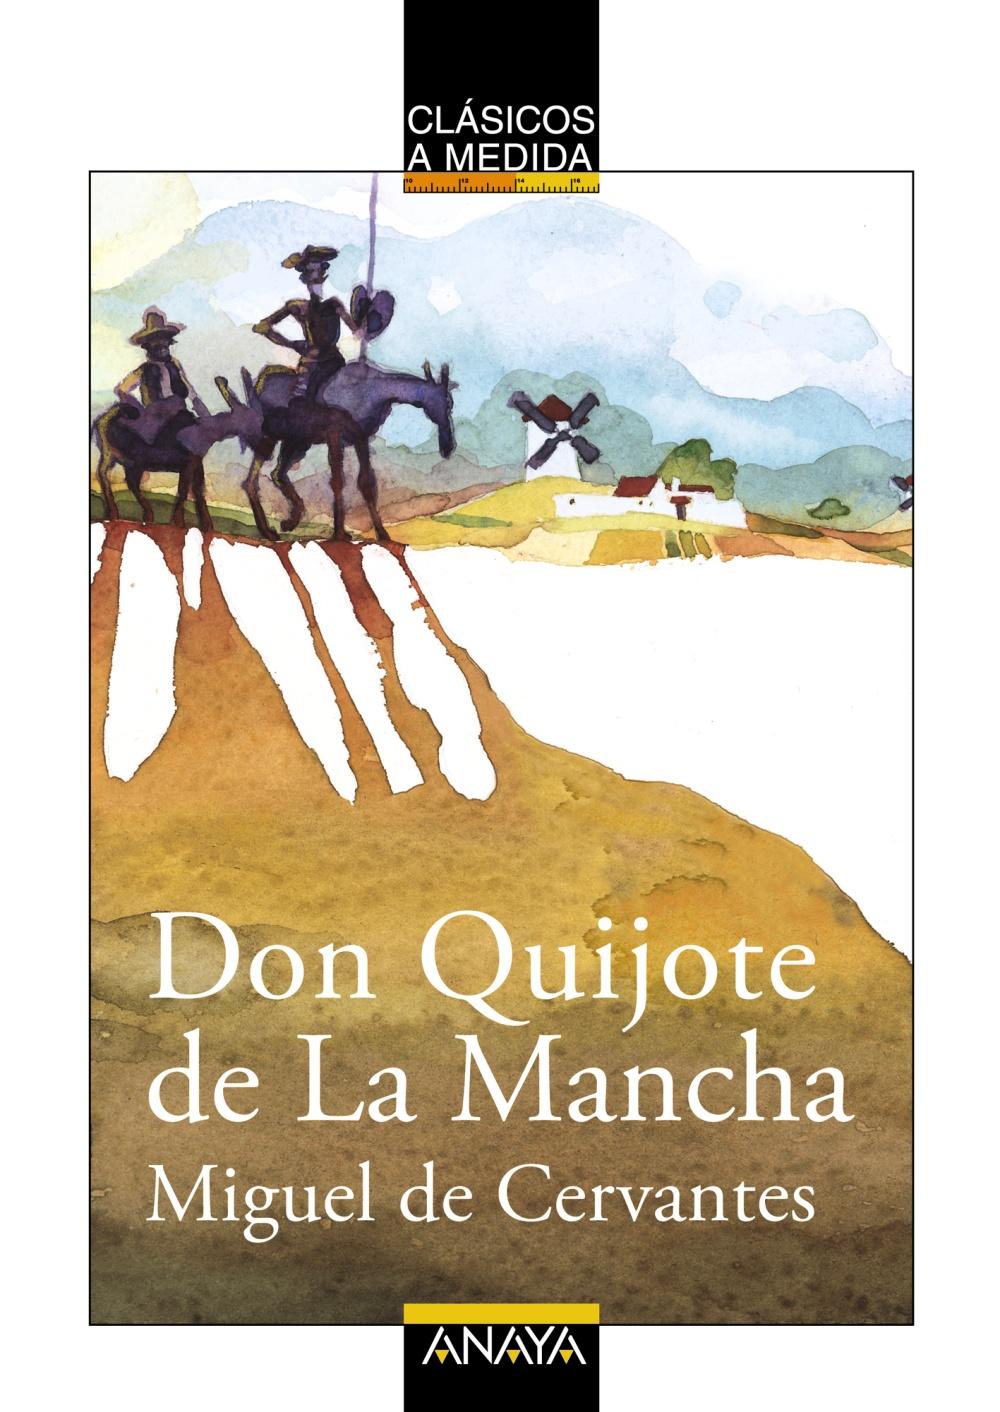 don quijote de la mancha libro completo